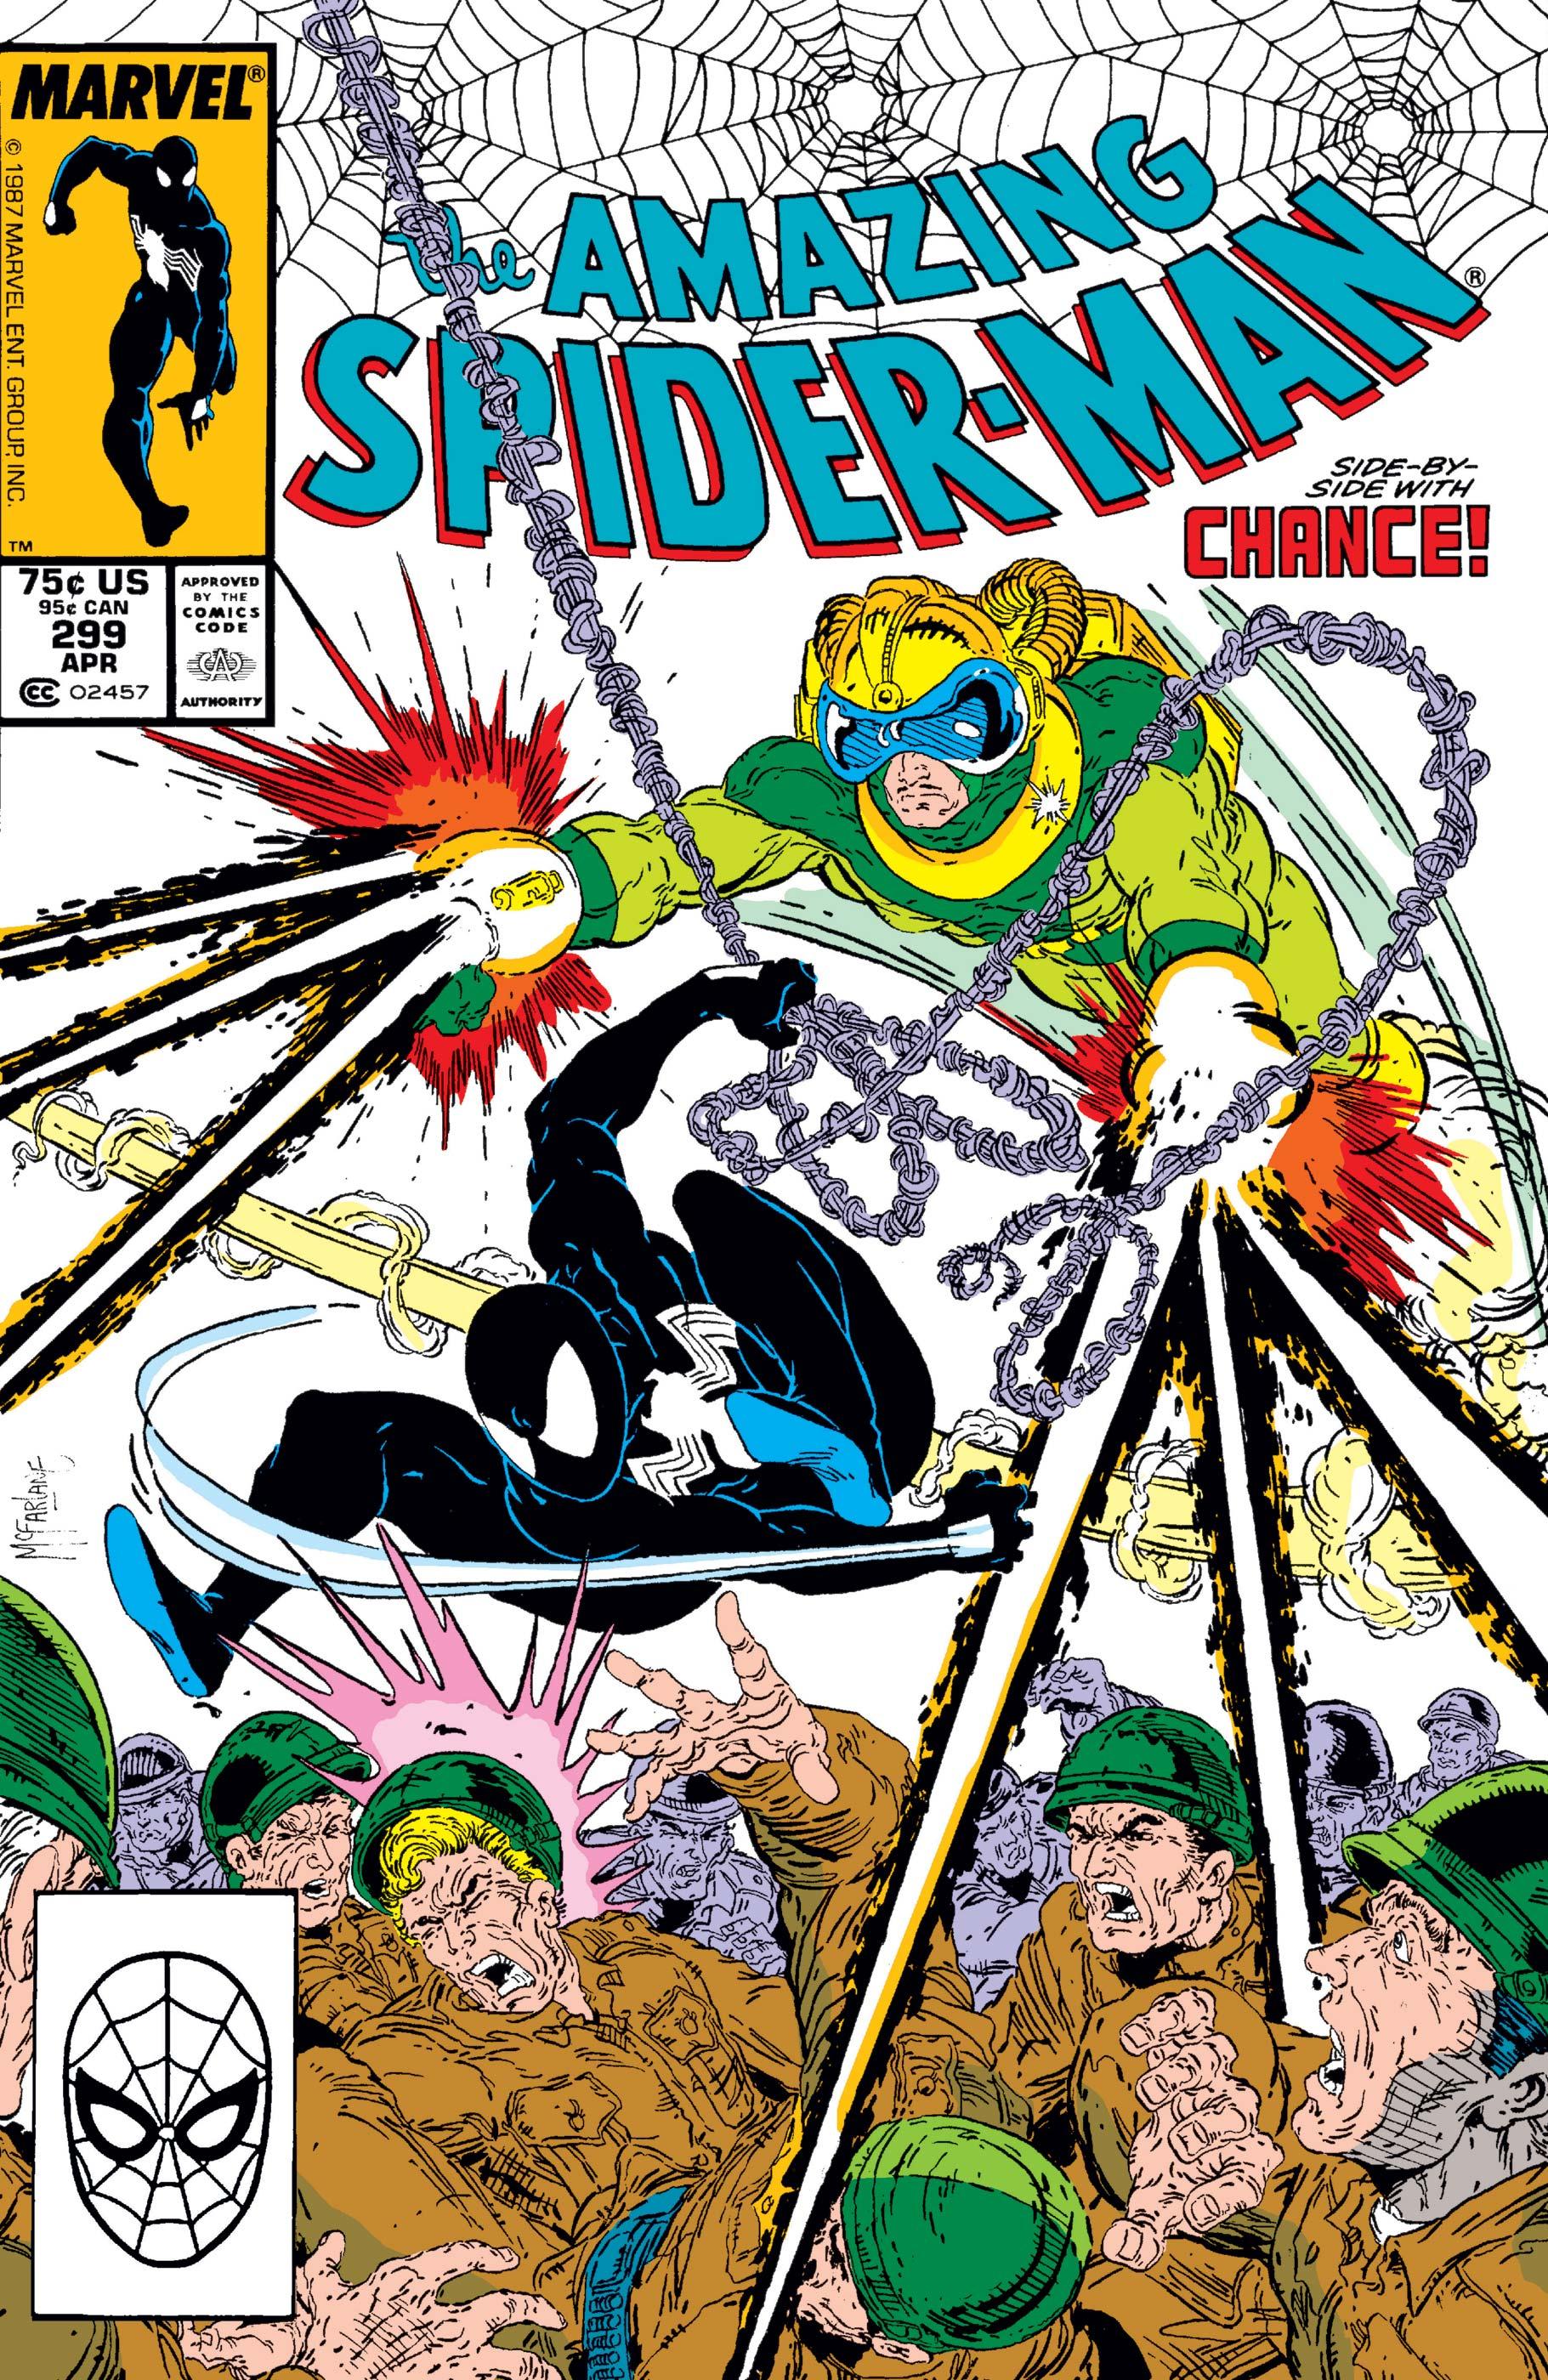 The Amazing Spider-Man (1963) #299